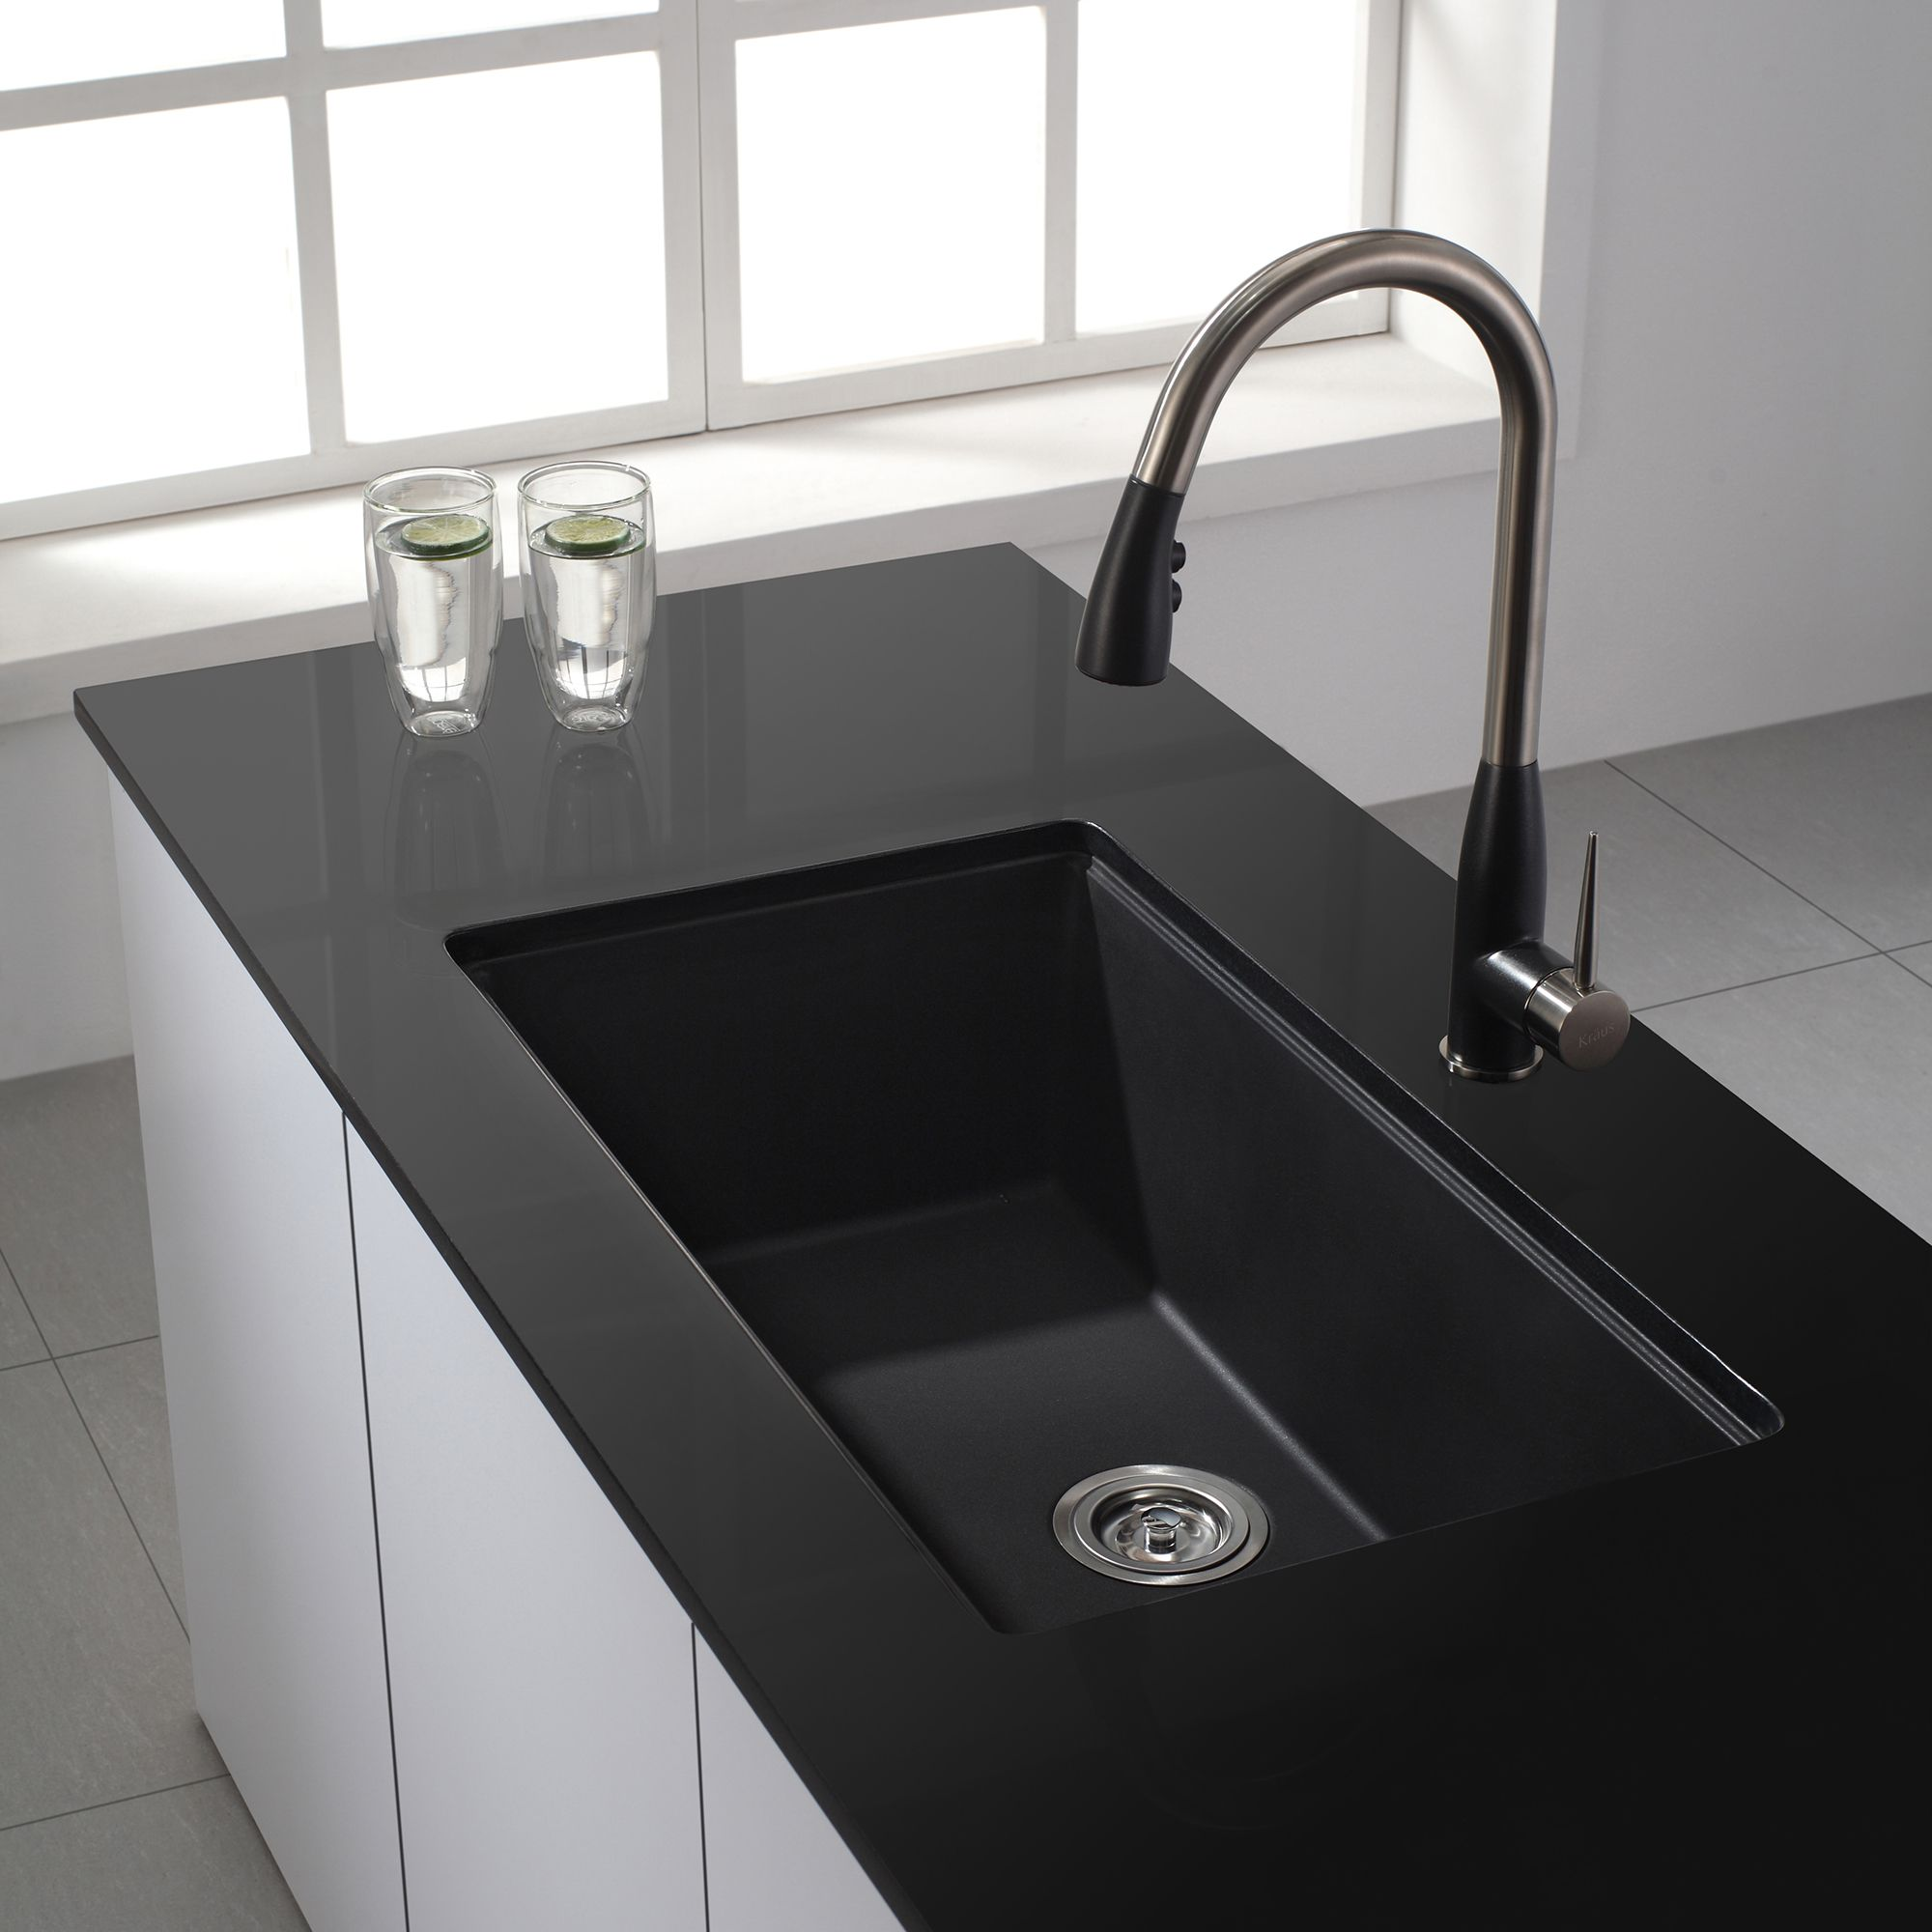 Art Of Arch Single Basin Kitchen Sink Granite Kitchen Sinks Kitchen Sink Install